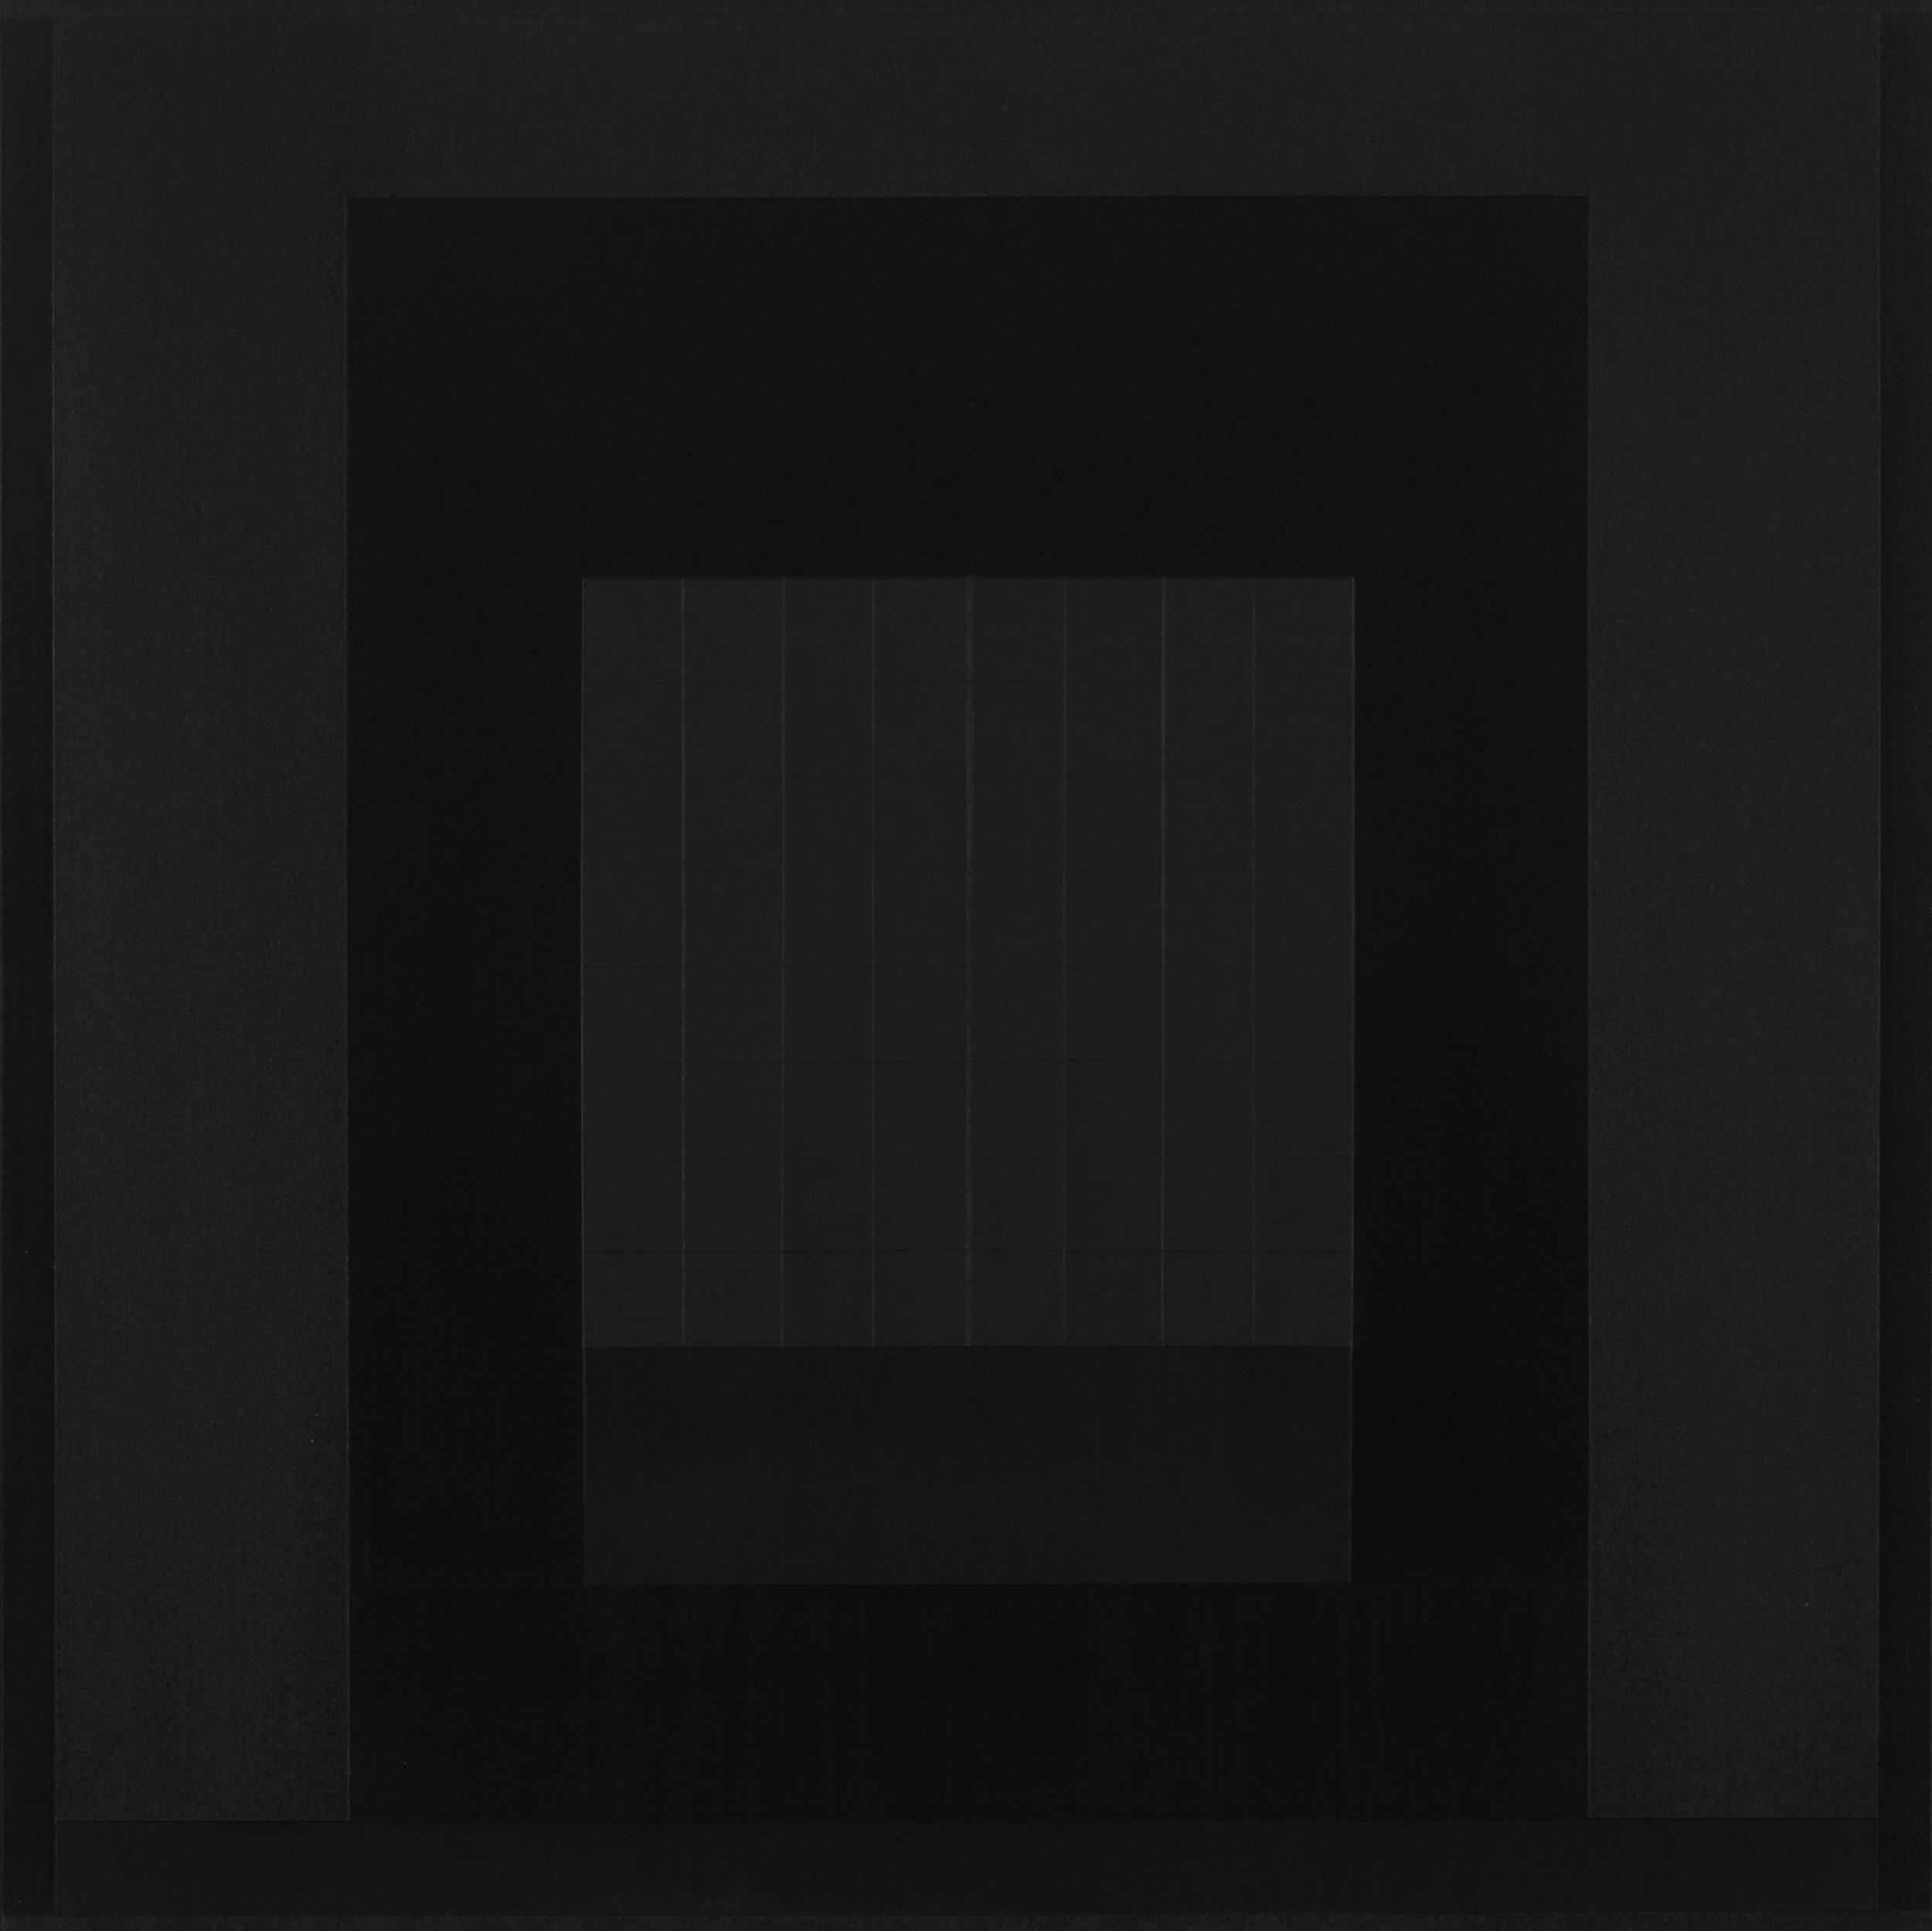 Yantra-ipsum-arkhē(5)2011.Jan, acrylic on canvas, 23 5/8 x 23 5/8 in. [60x60cm]